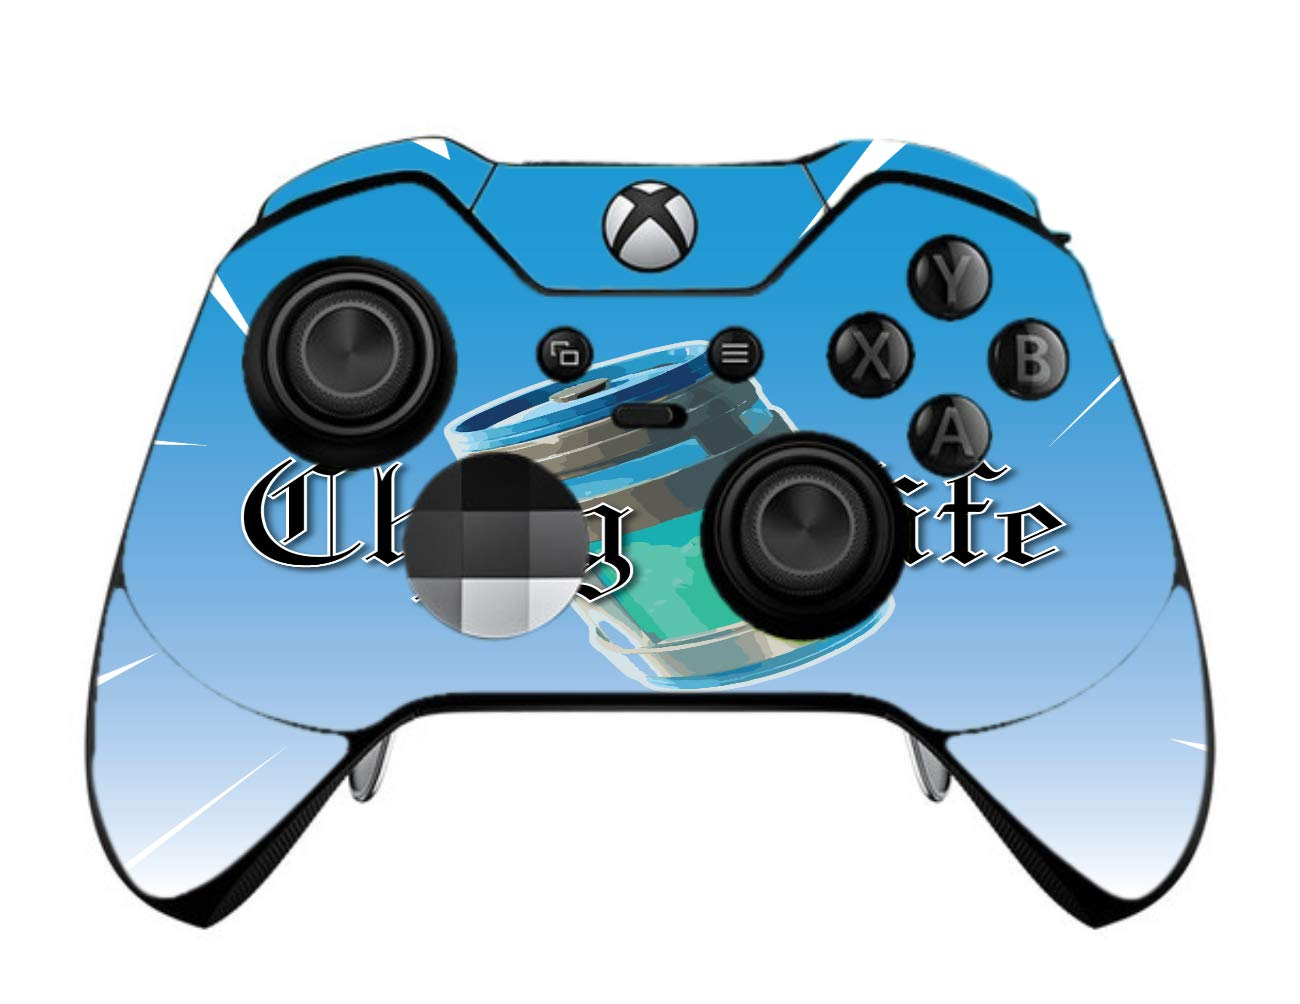 Chug Life Vinyl Decal Sticker Skin by EandM for Xbox One Elite Controller